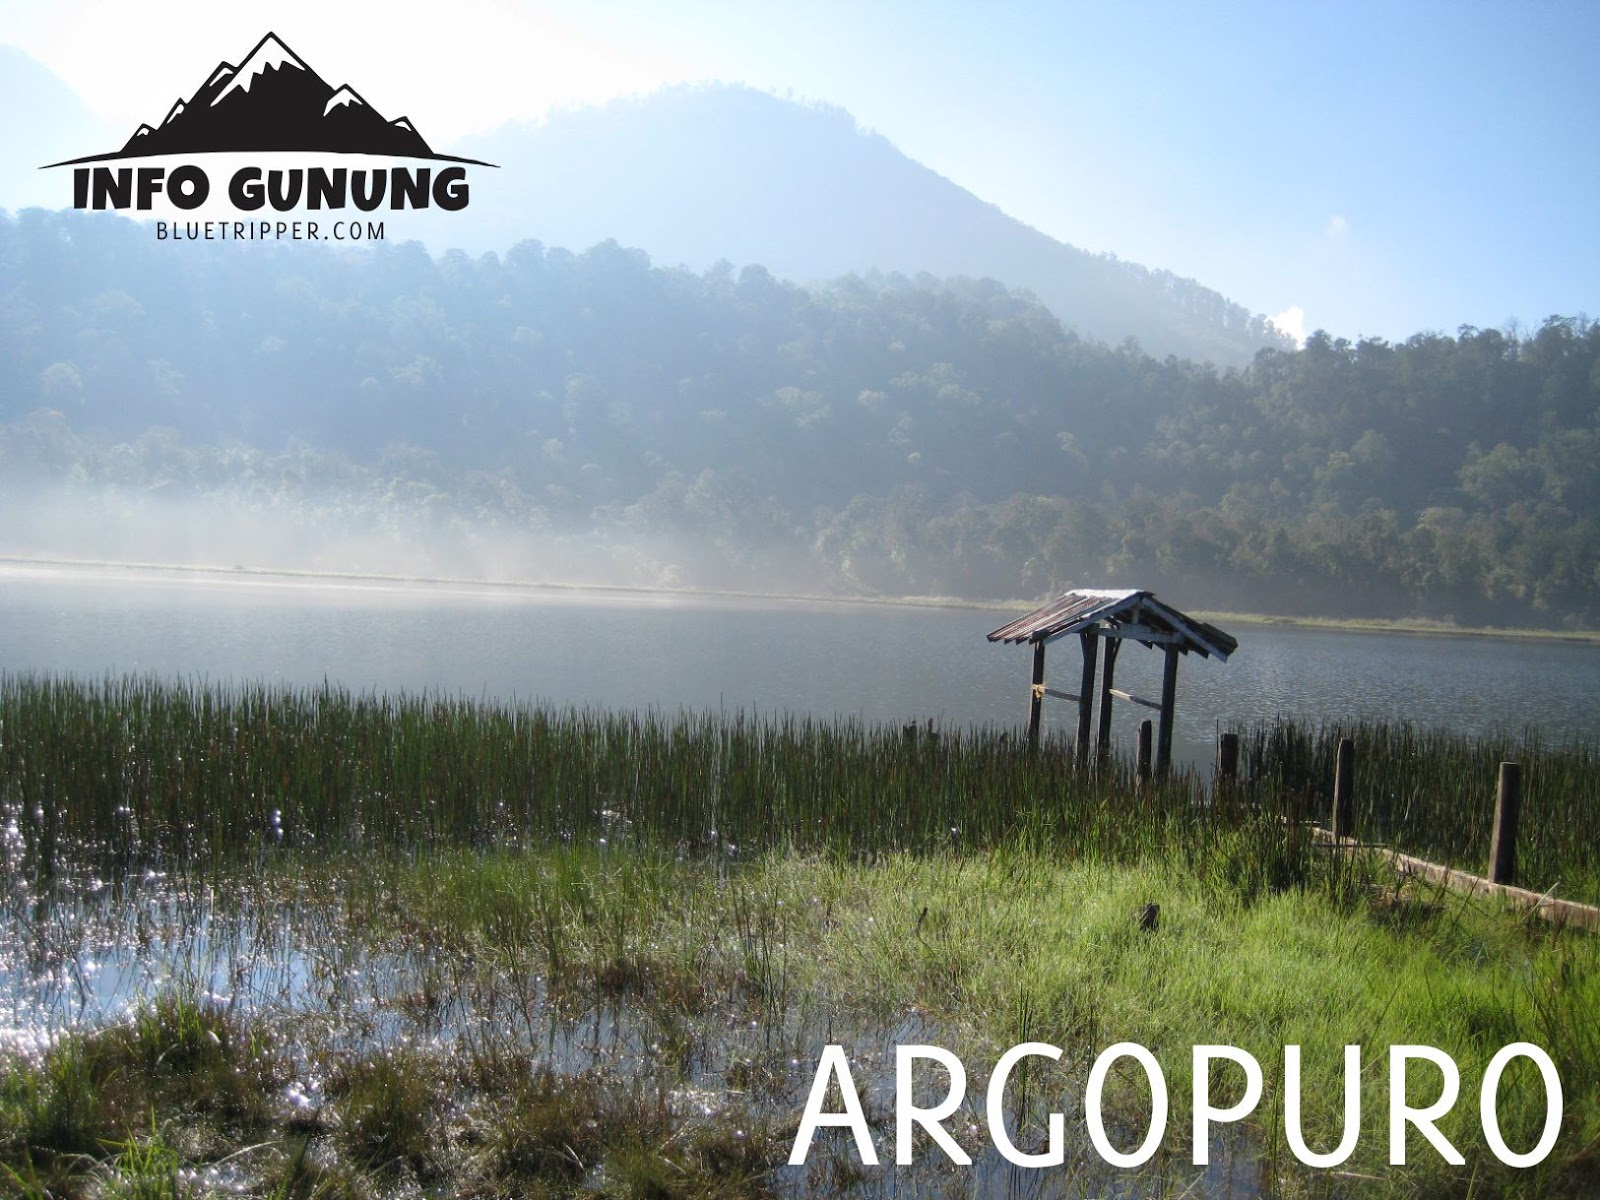 Gunung Argopuro 3 088 Mdpl Kab Probolinggo